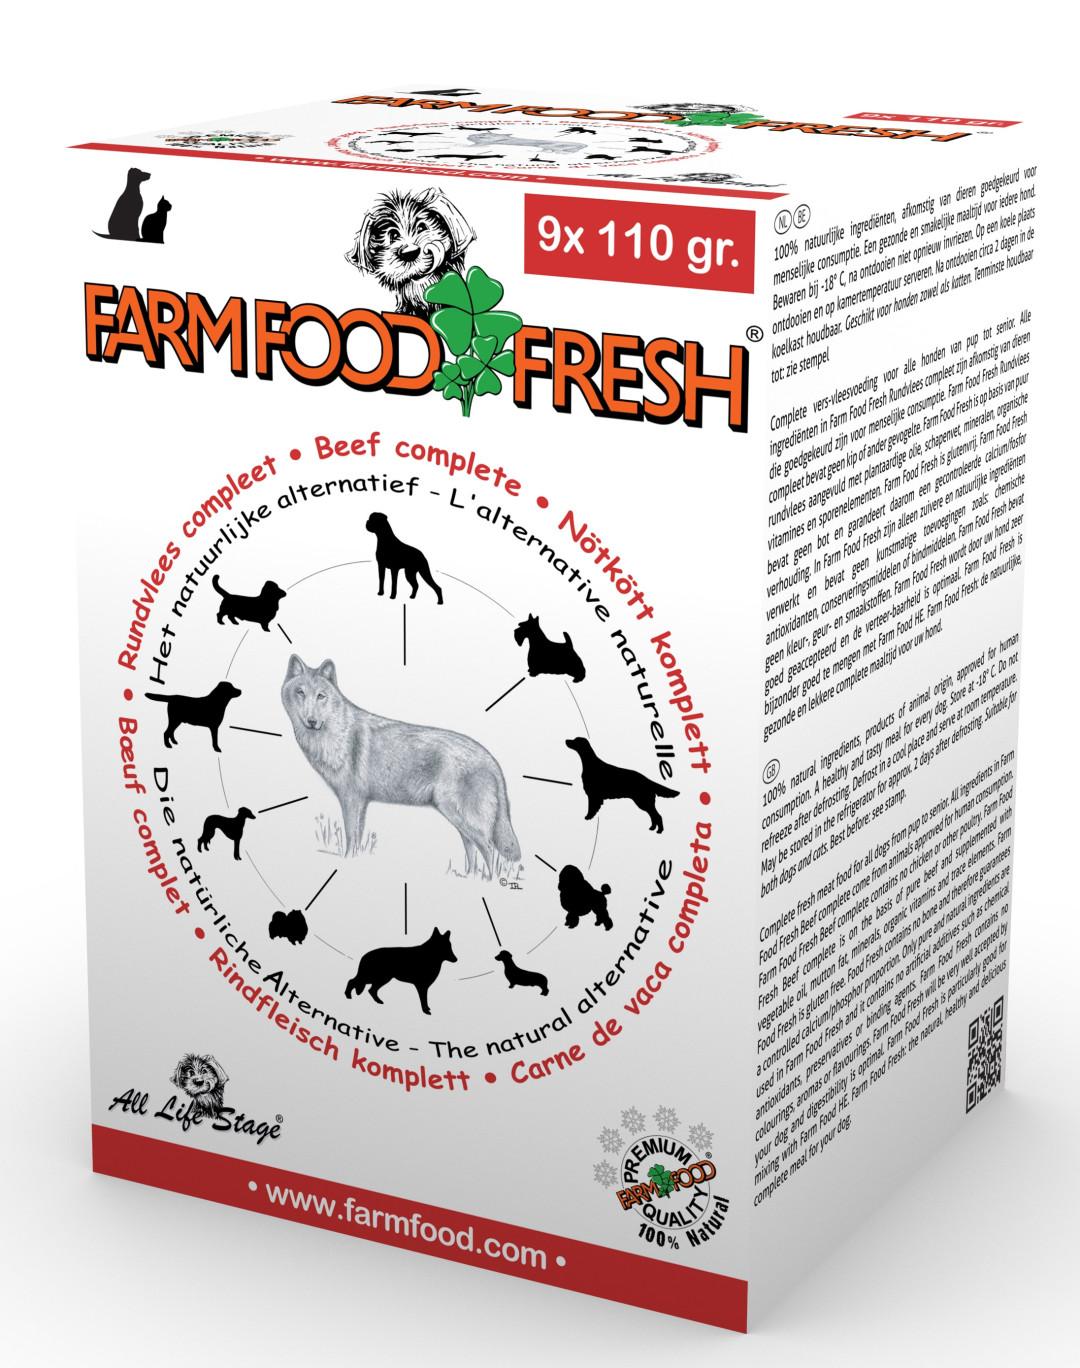 Farm Food Fresh hondenvoer rundvlees compleet 9 x 110 gr